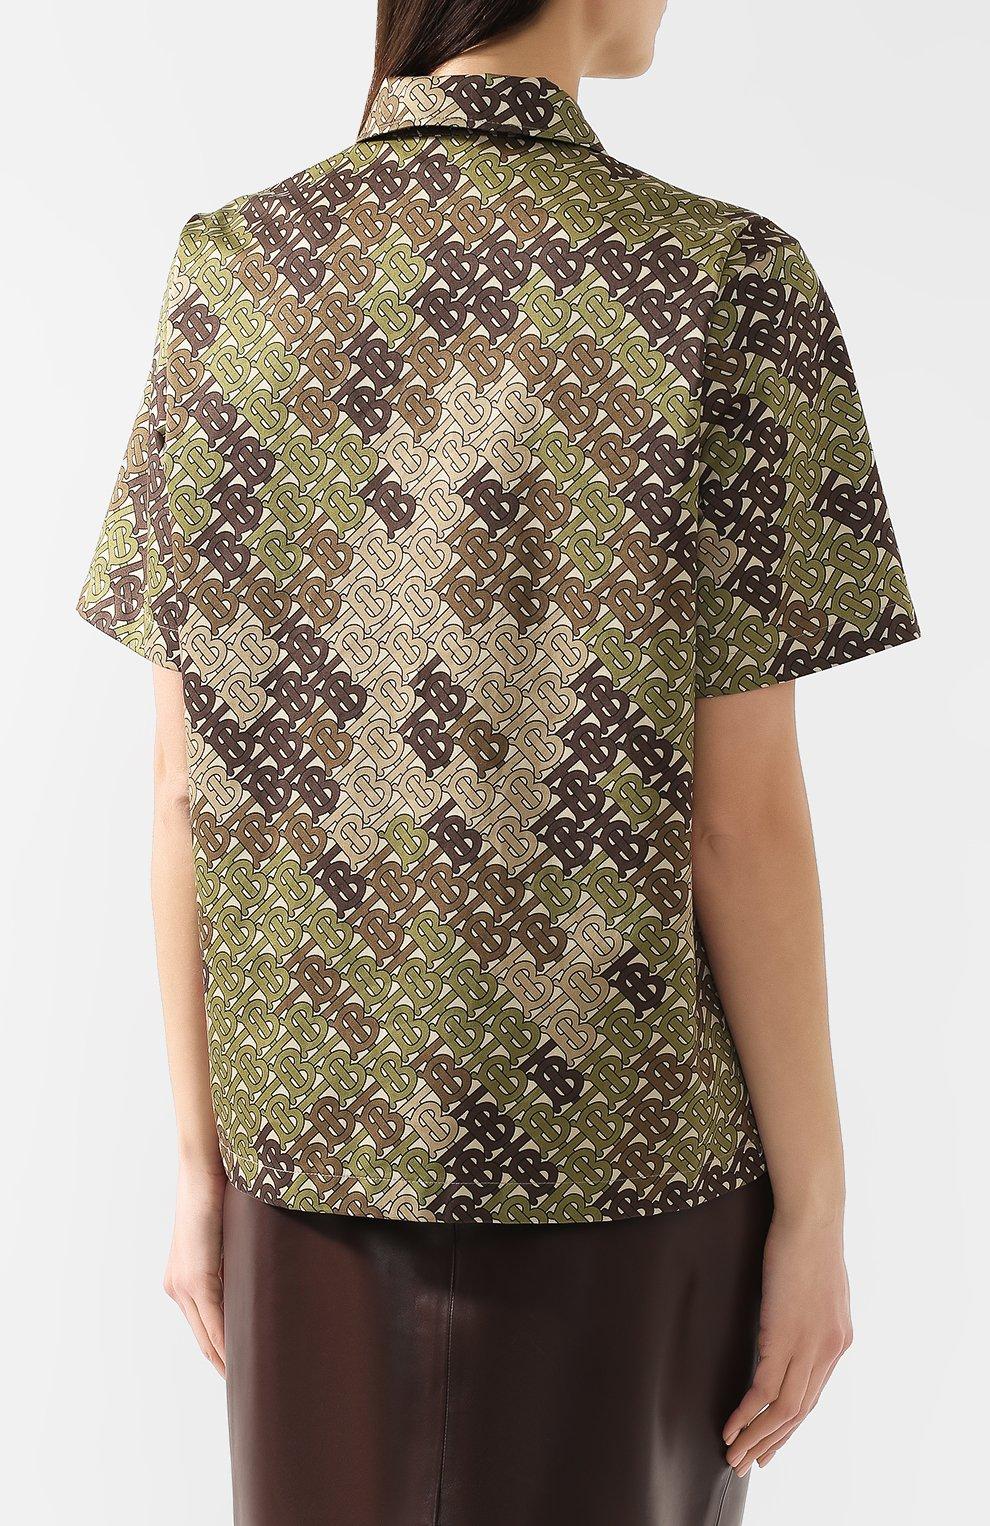 Хлопковая футболка Burberry хаки | Фото №4